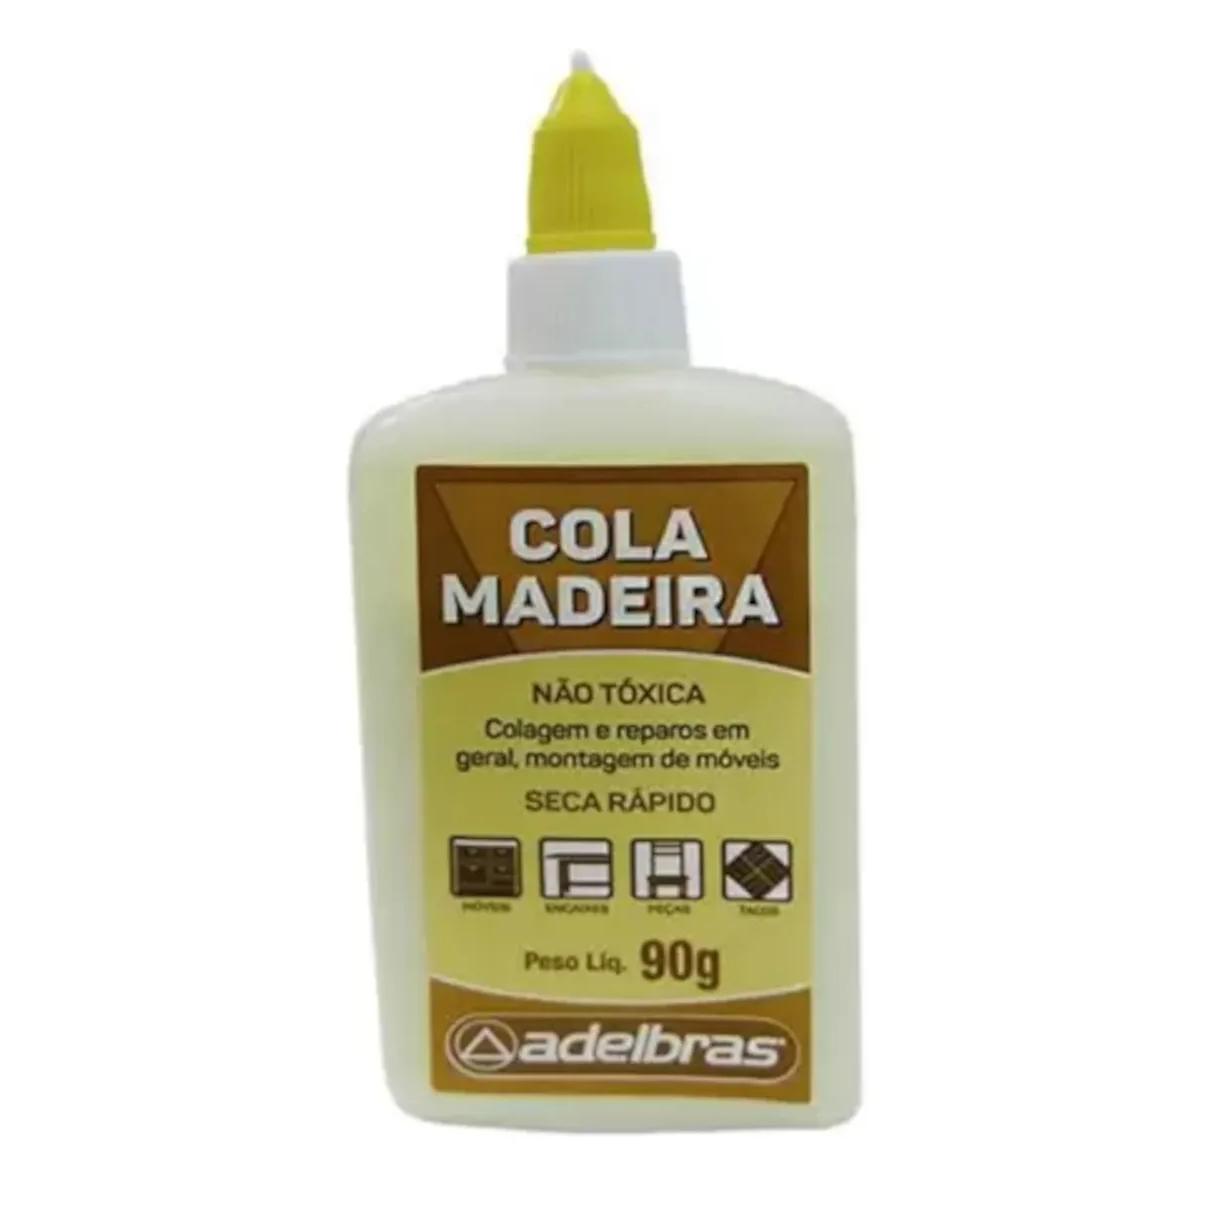 Cola de Madeira 90g - Adelbras